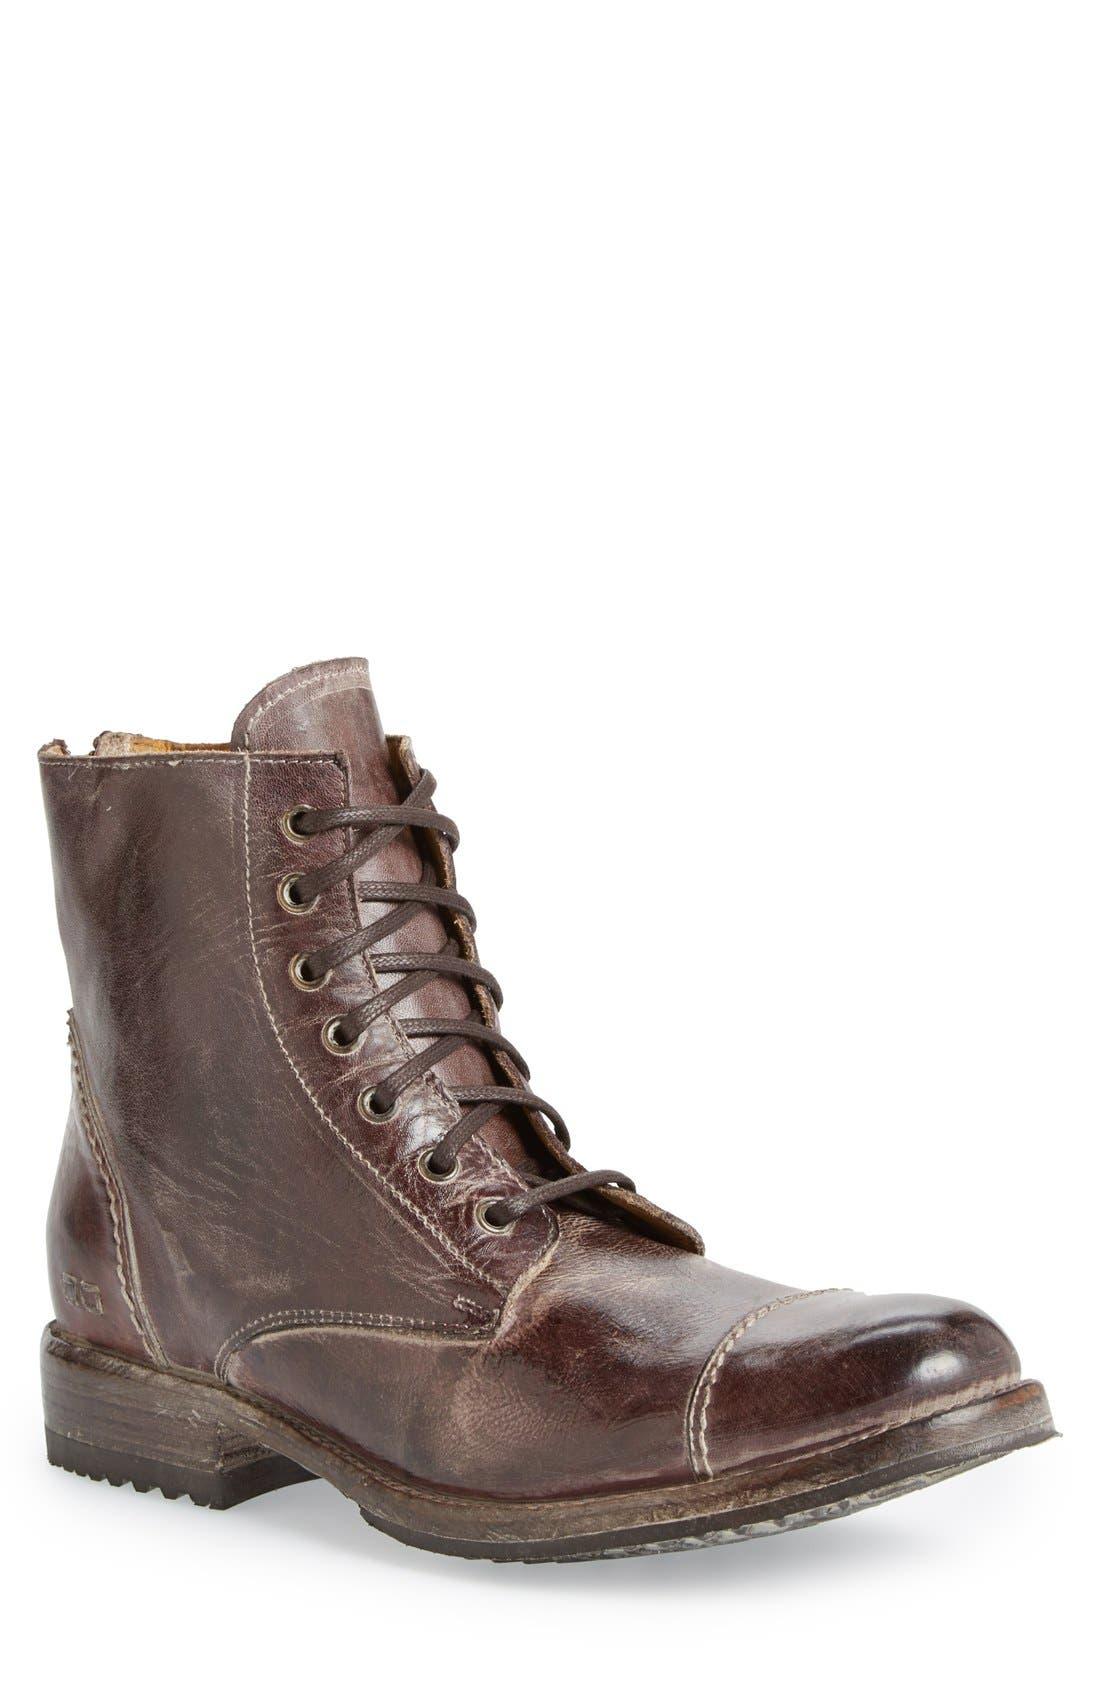 Alternate Image 1 Selected - Bed Stu 'Protégé' Cap Toe Boot (Men)